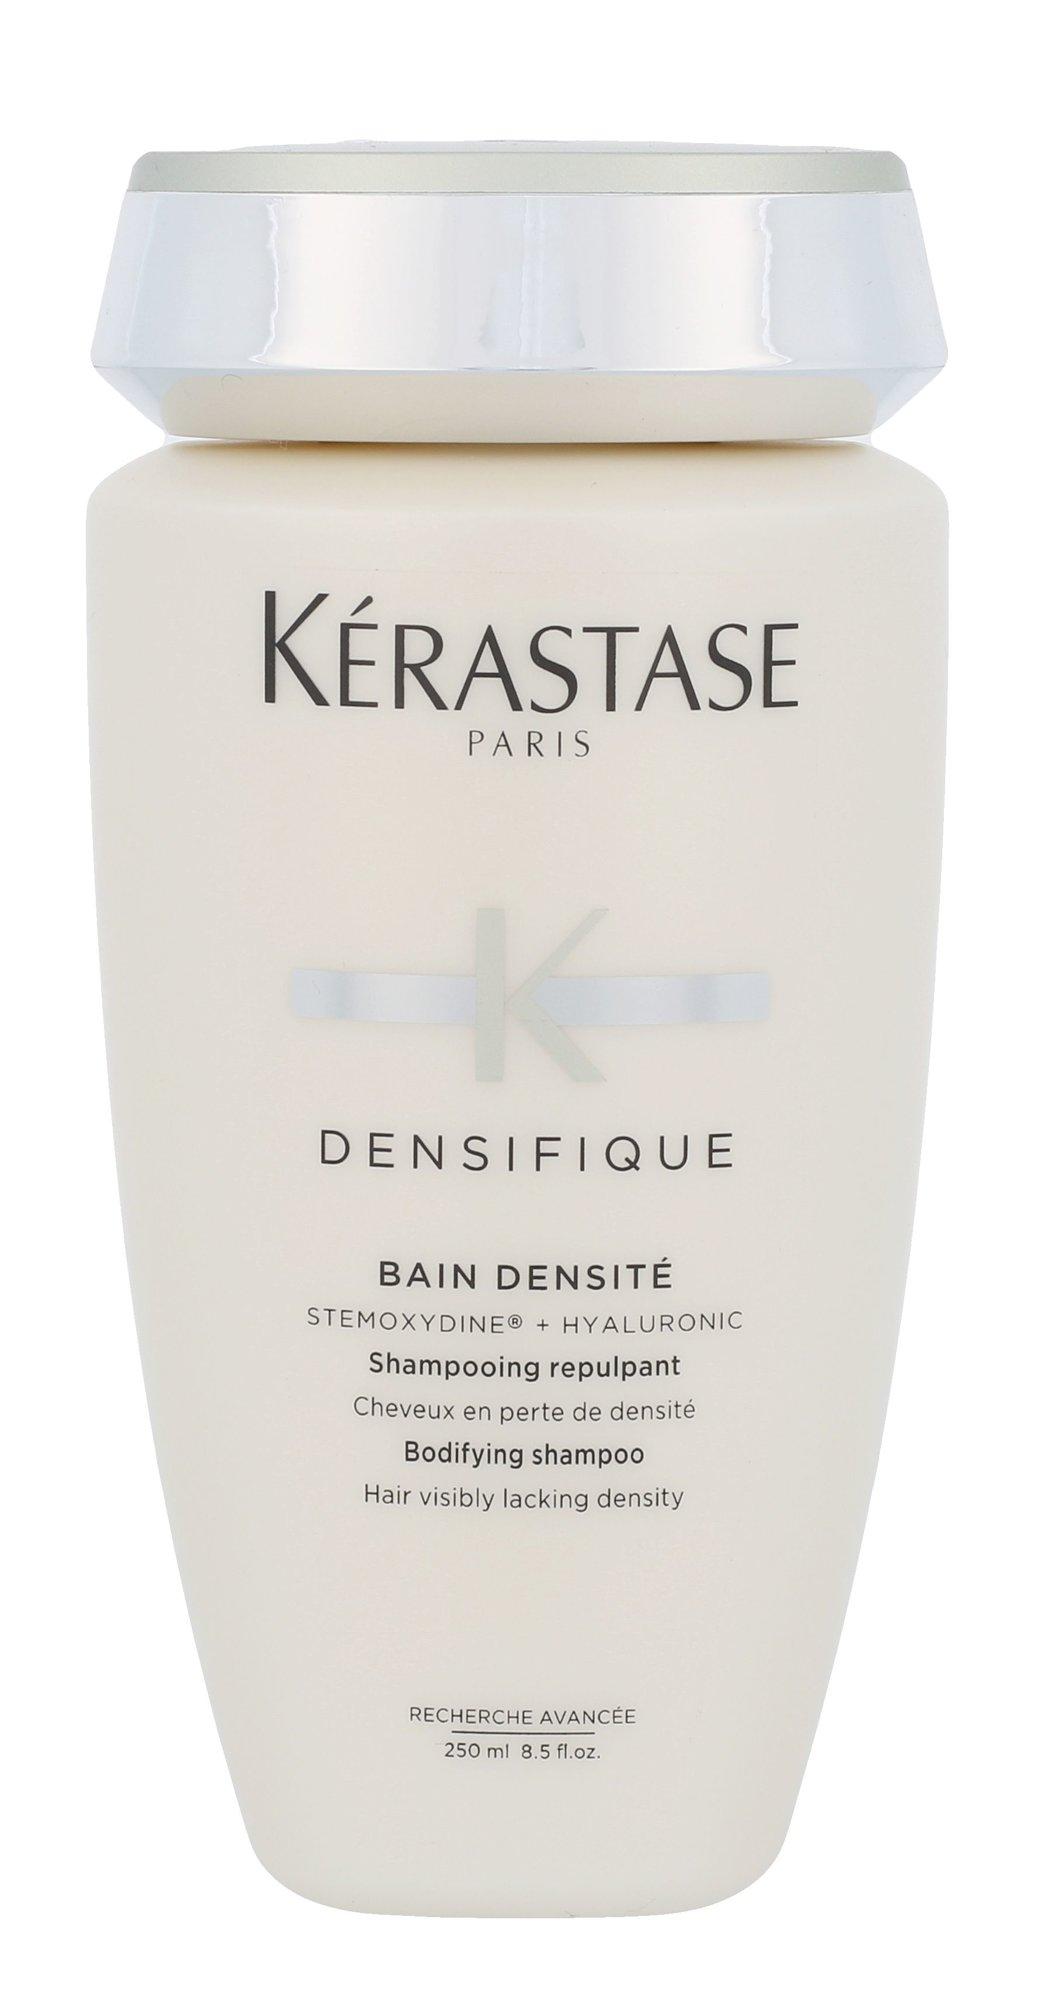 Kérastase Densifique Cosmetic 250ml